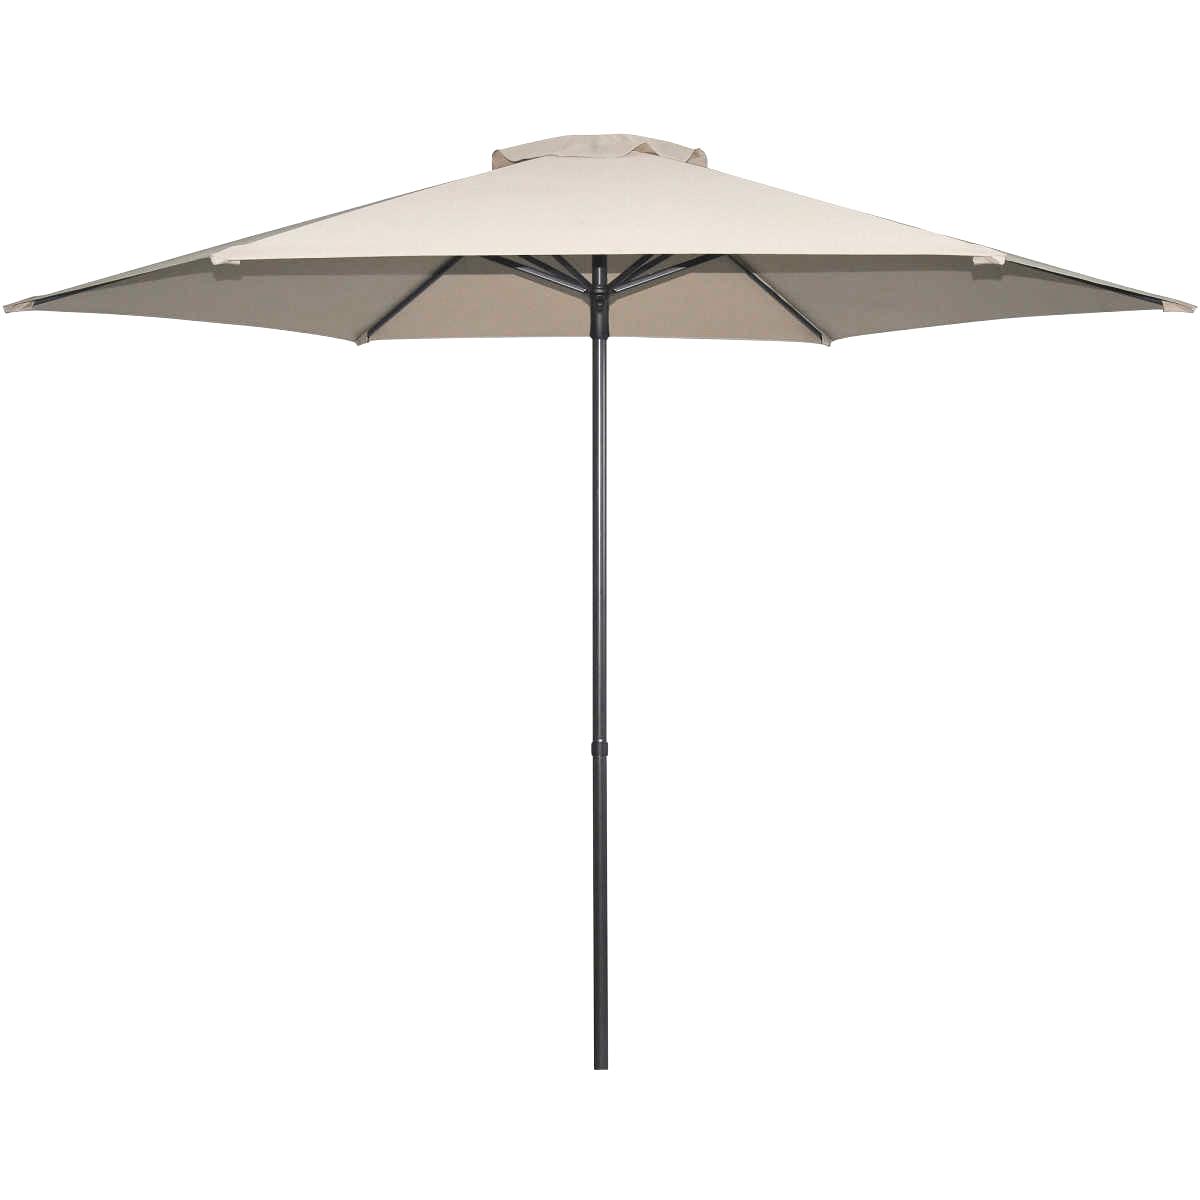 Market Umbrellas In Fashionable Market Umbrella (View 12 of 20)